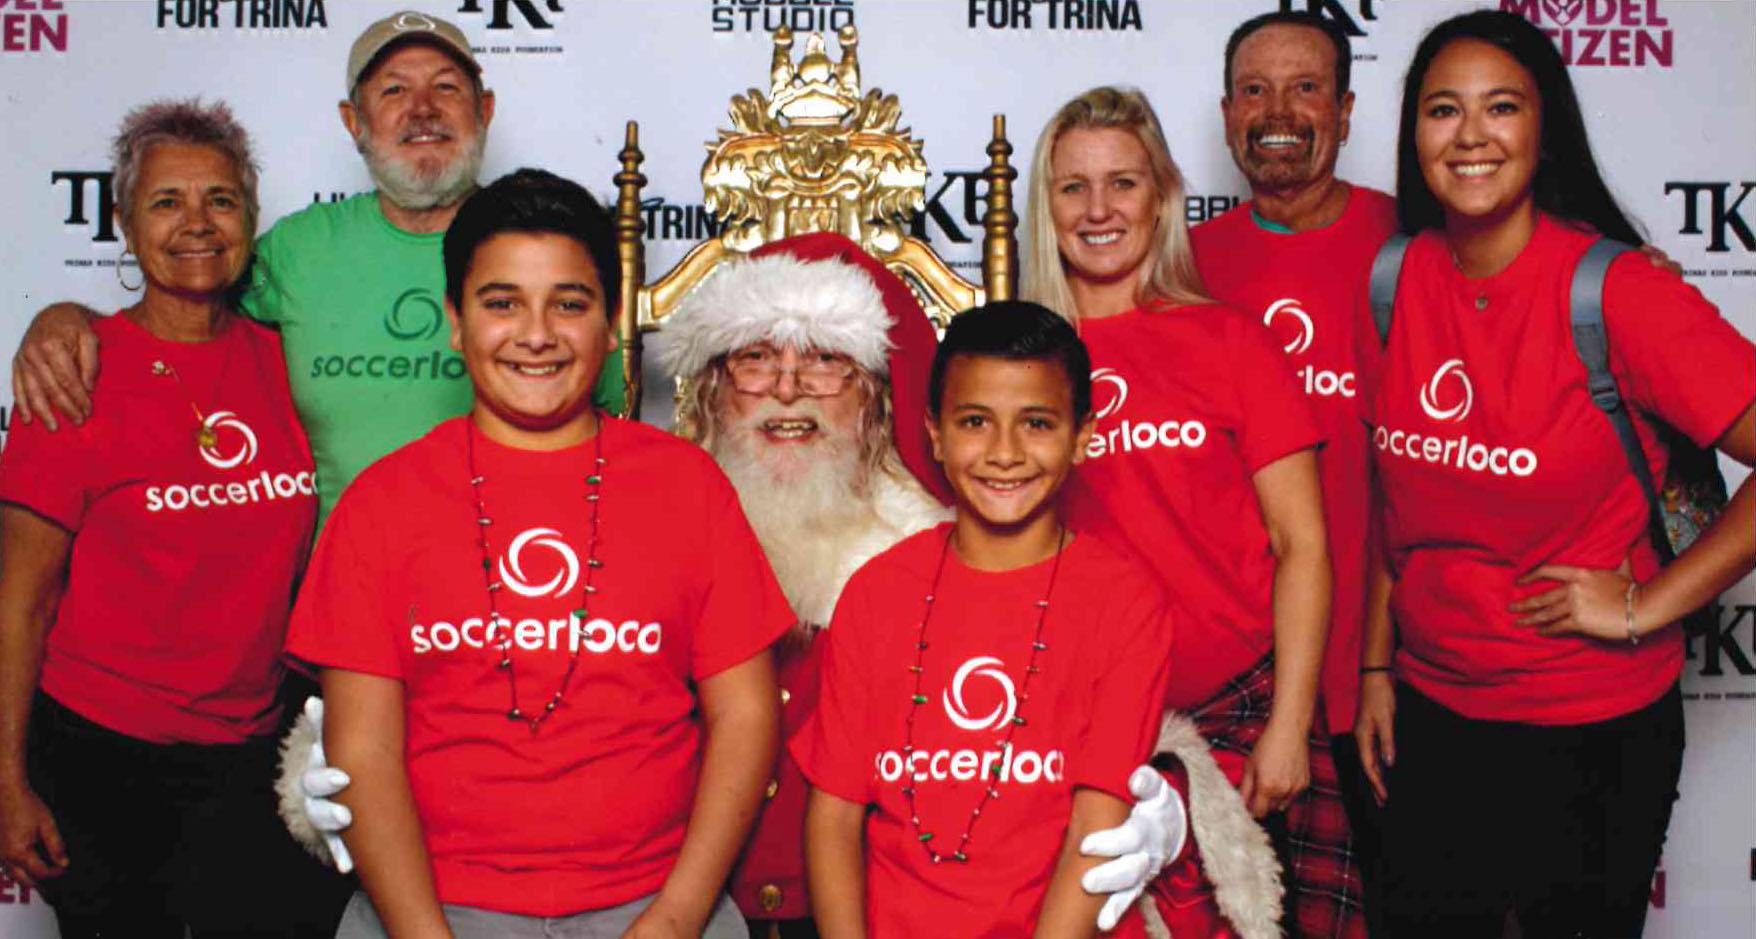 soccerloco Donates to Trina's Kids